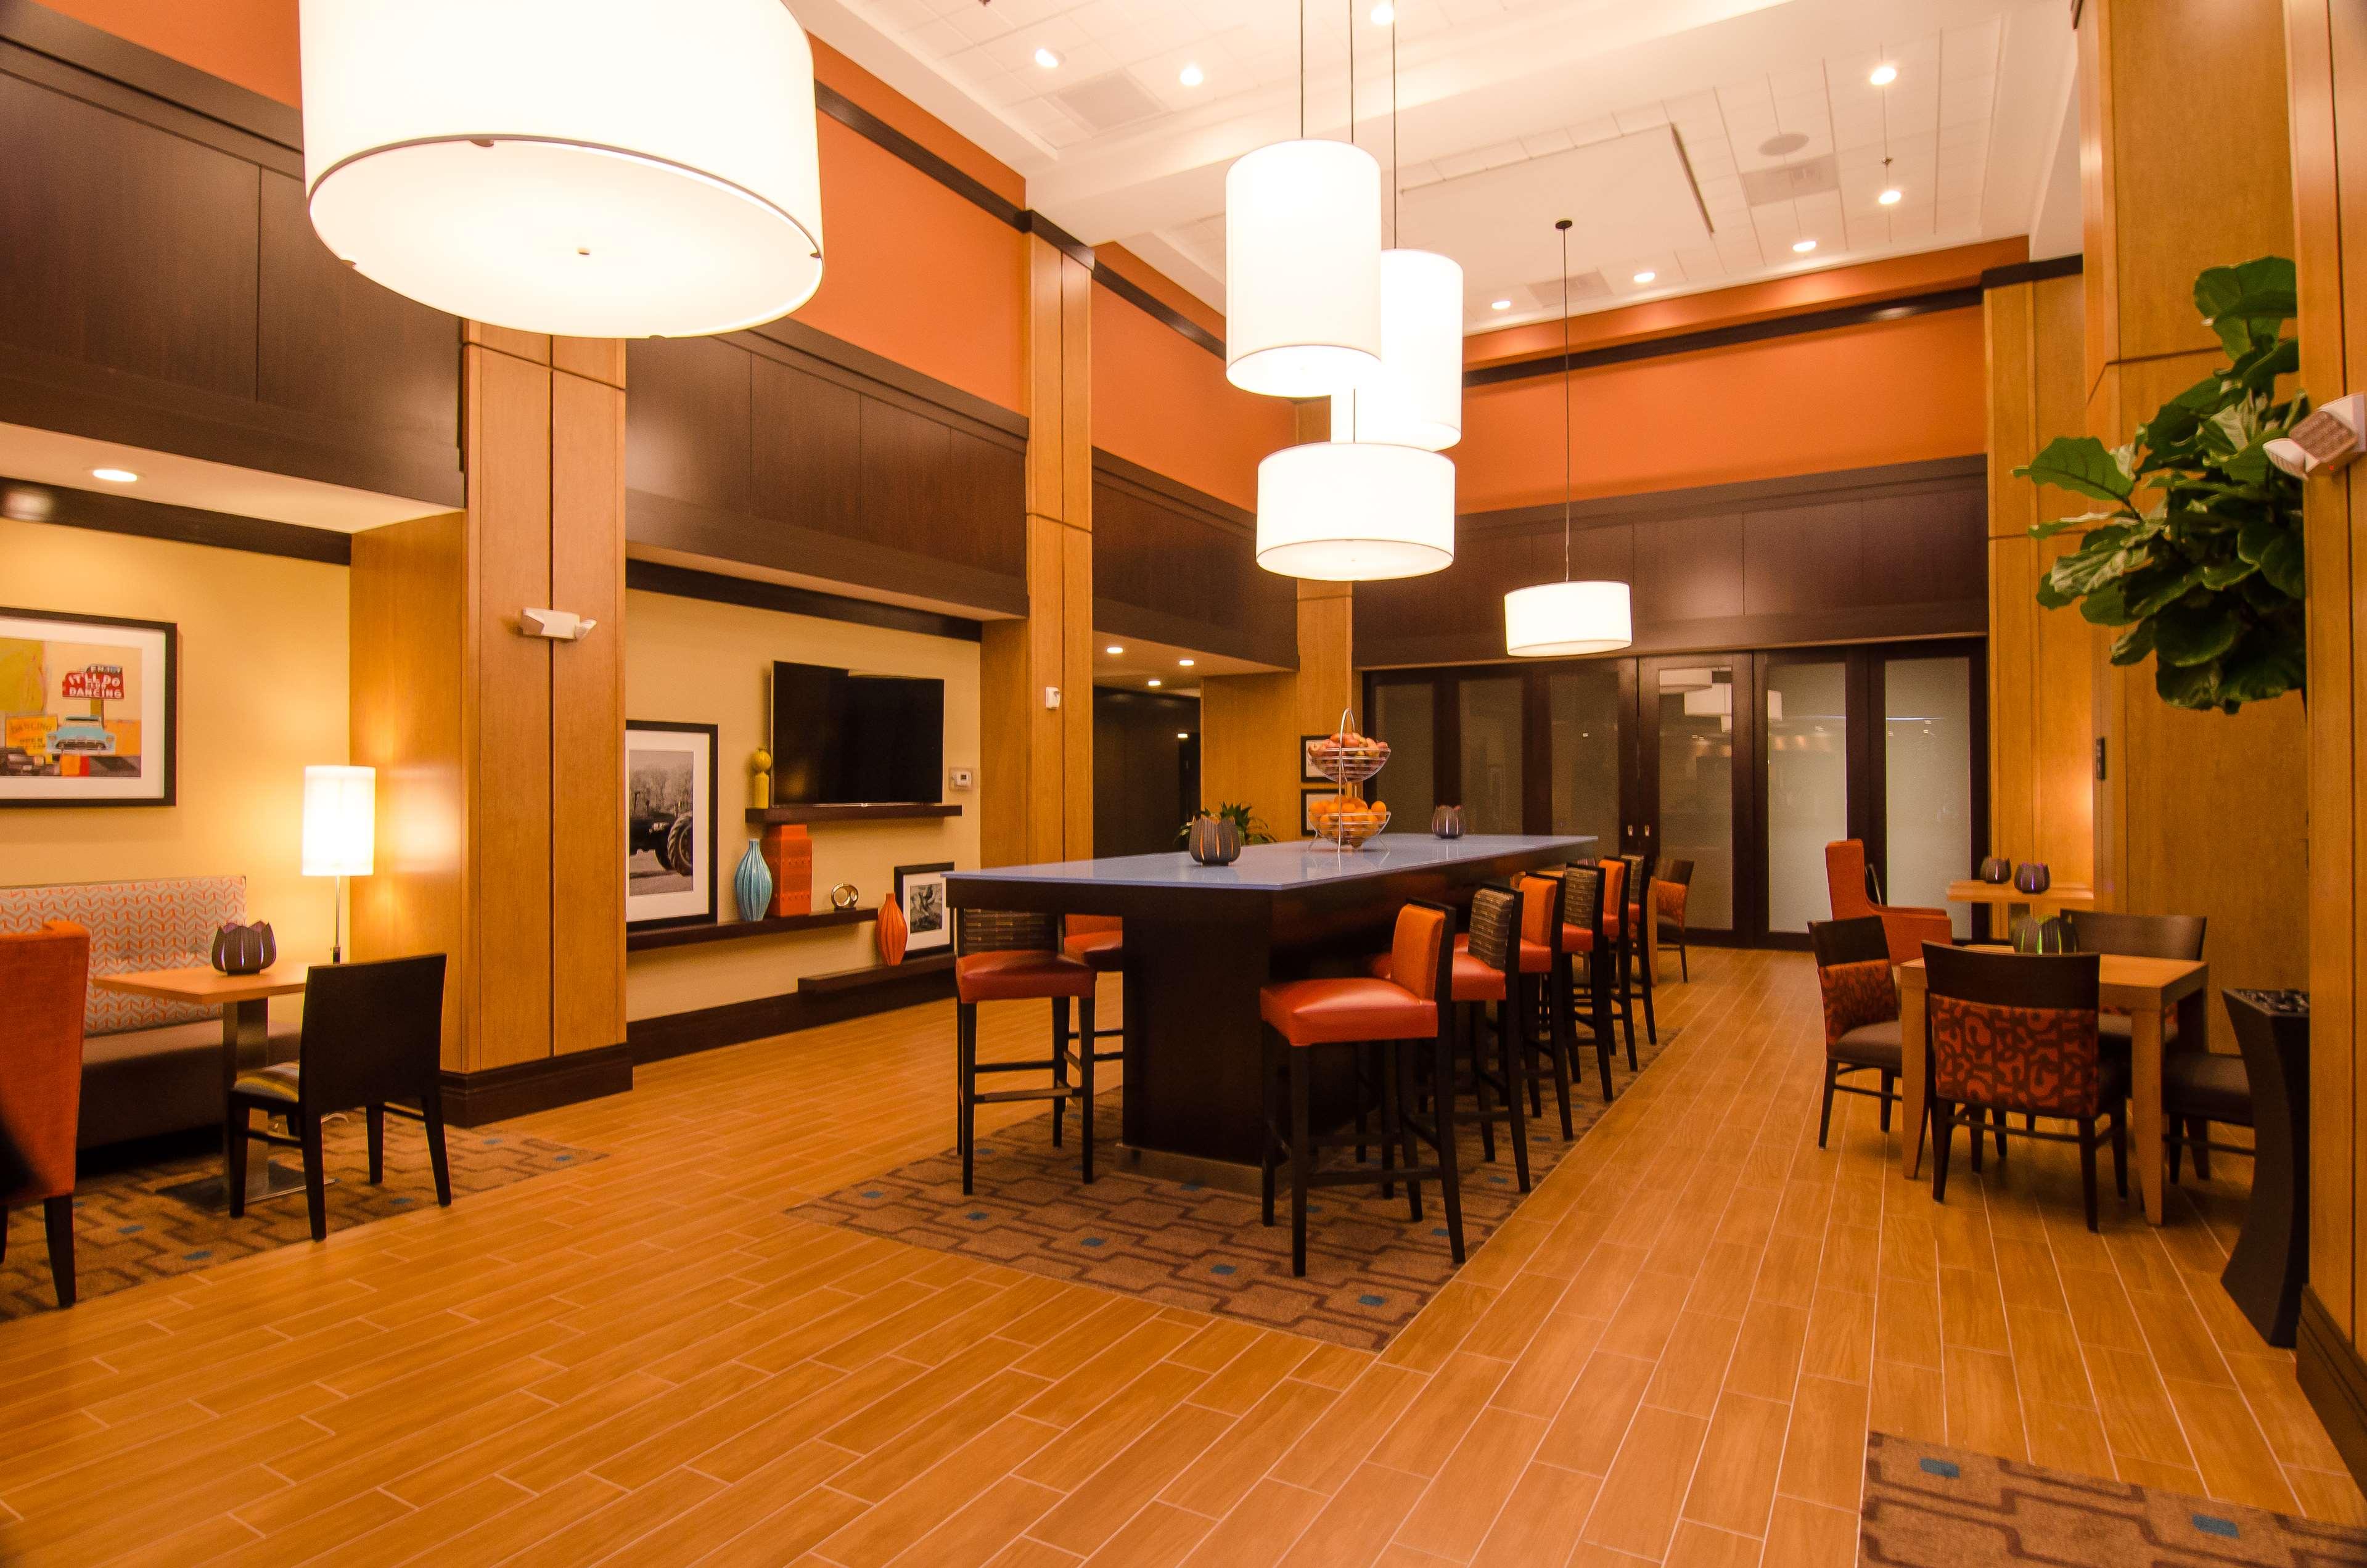 Hampton Inn & Suites Houston North IAH image 3